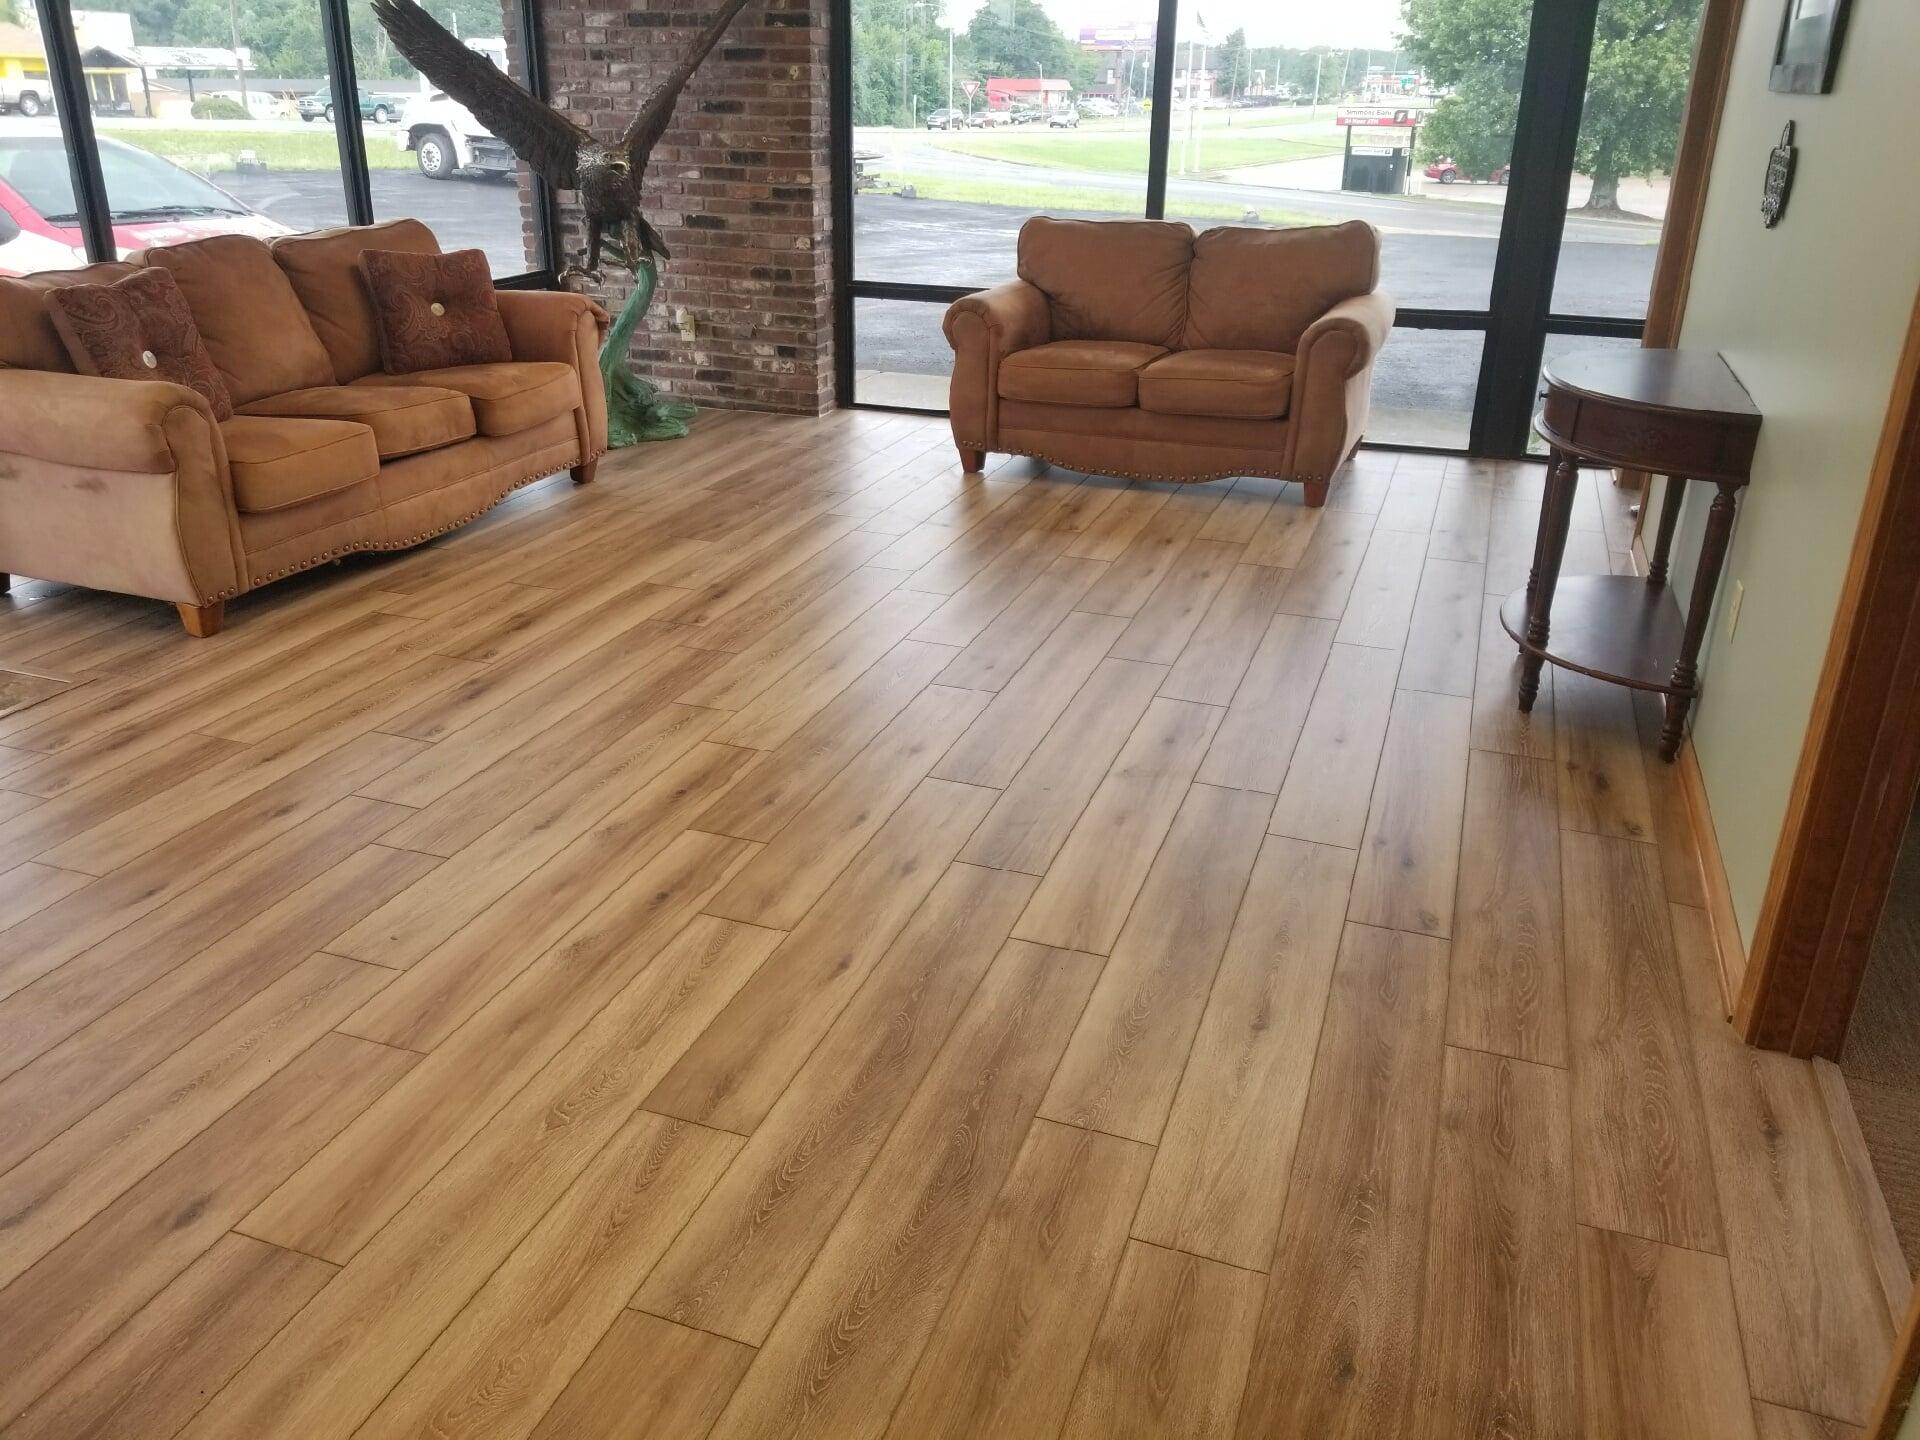 Luxury vinyl planks from Roop's Carpet in Bald Knob, AR